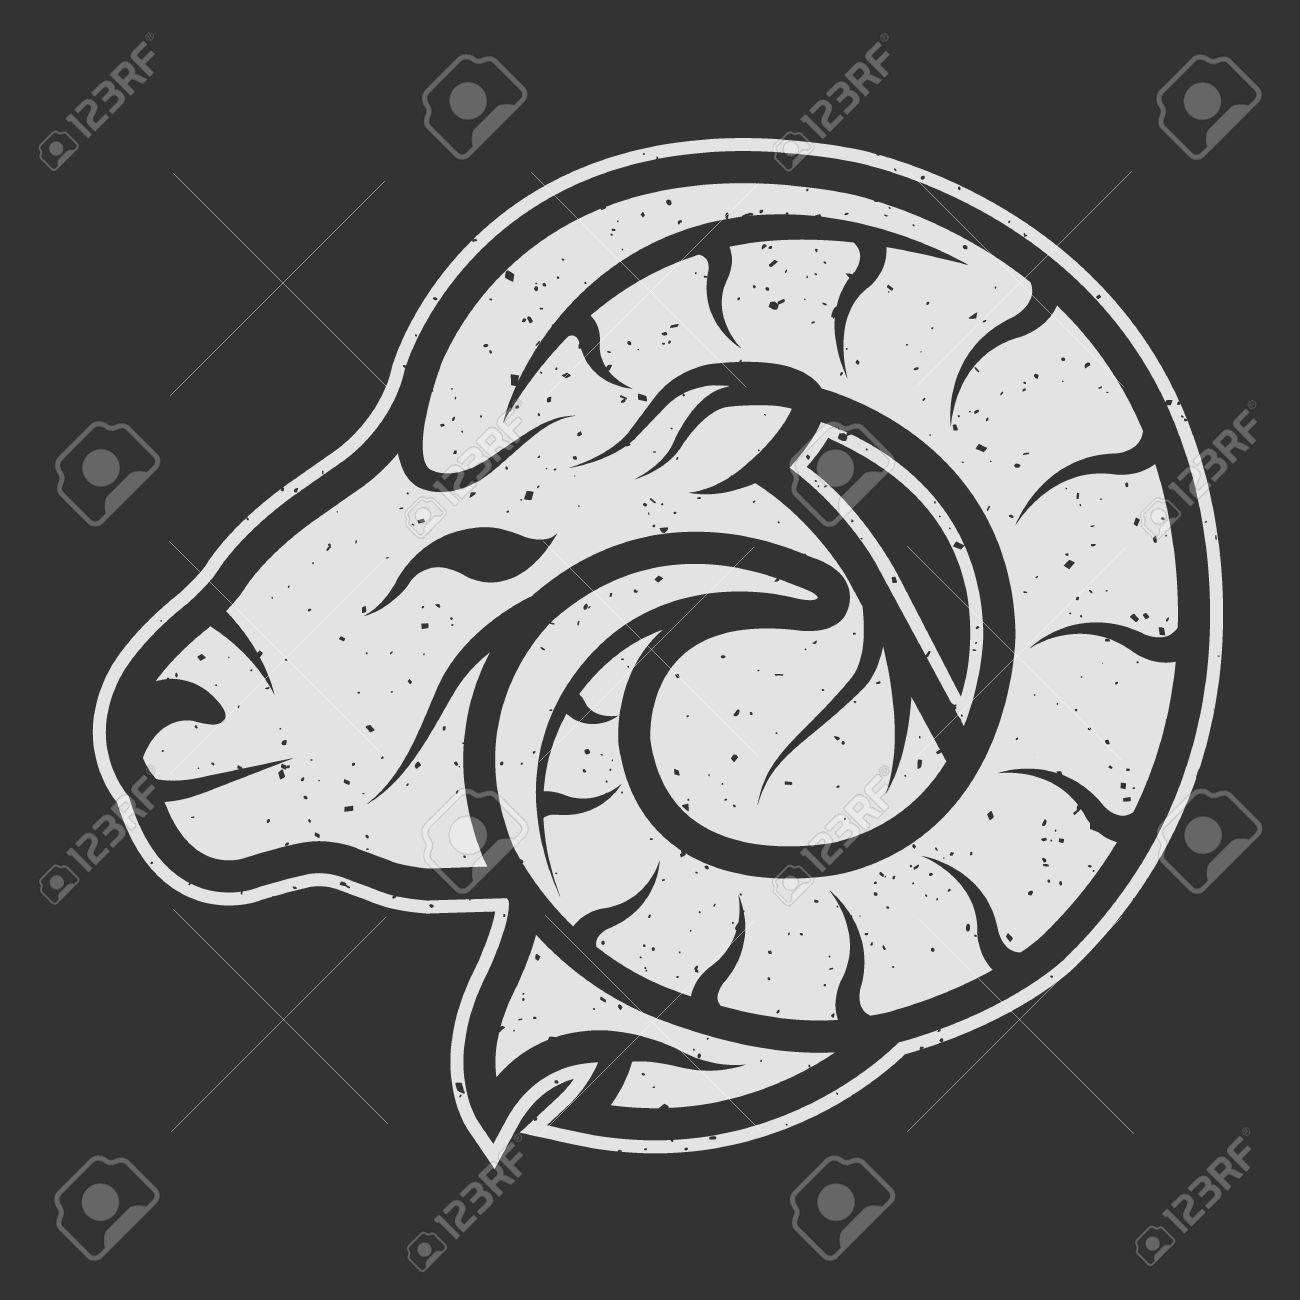 Sheep symbol logo for dark background. Vintage linear style. - 45946227